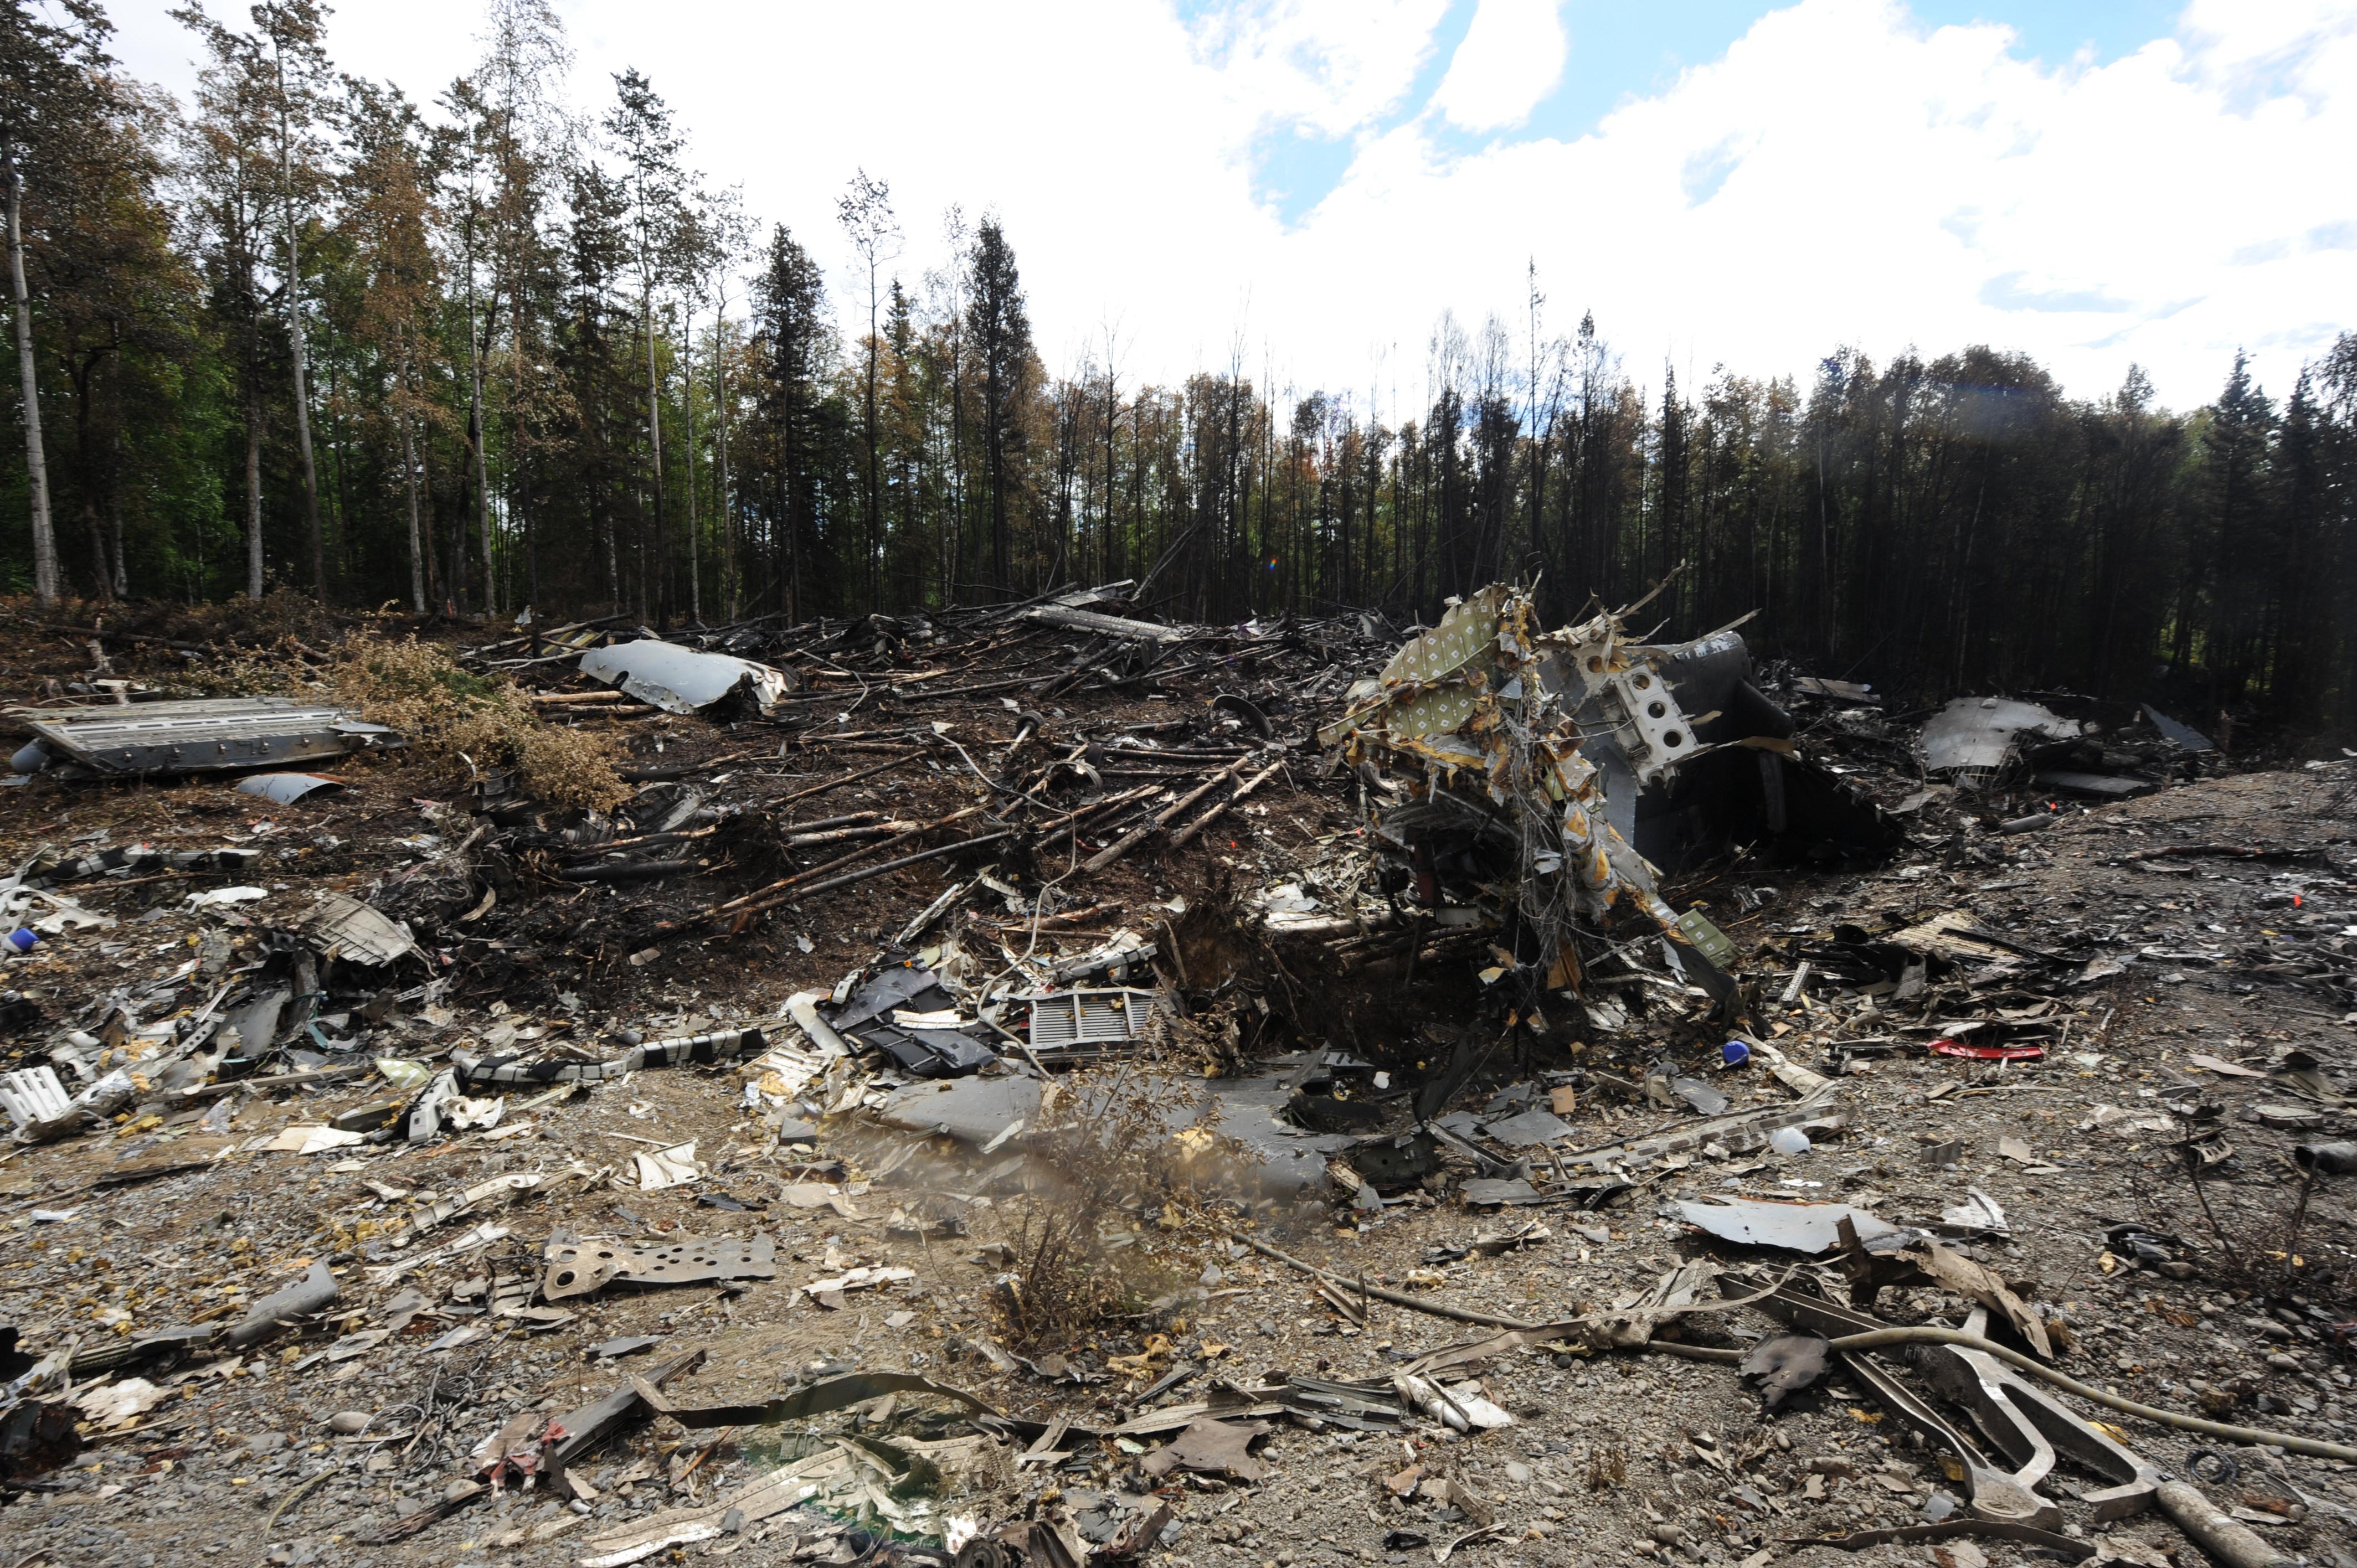 2010 Alaska C17 crash  Military Wiki  Fandom powered by